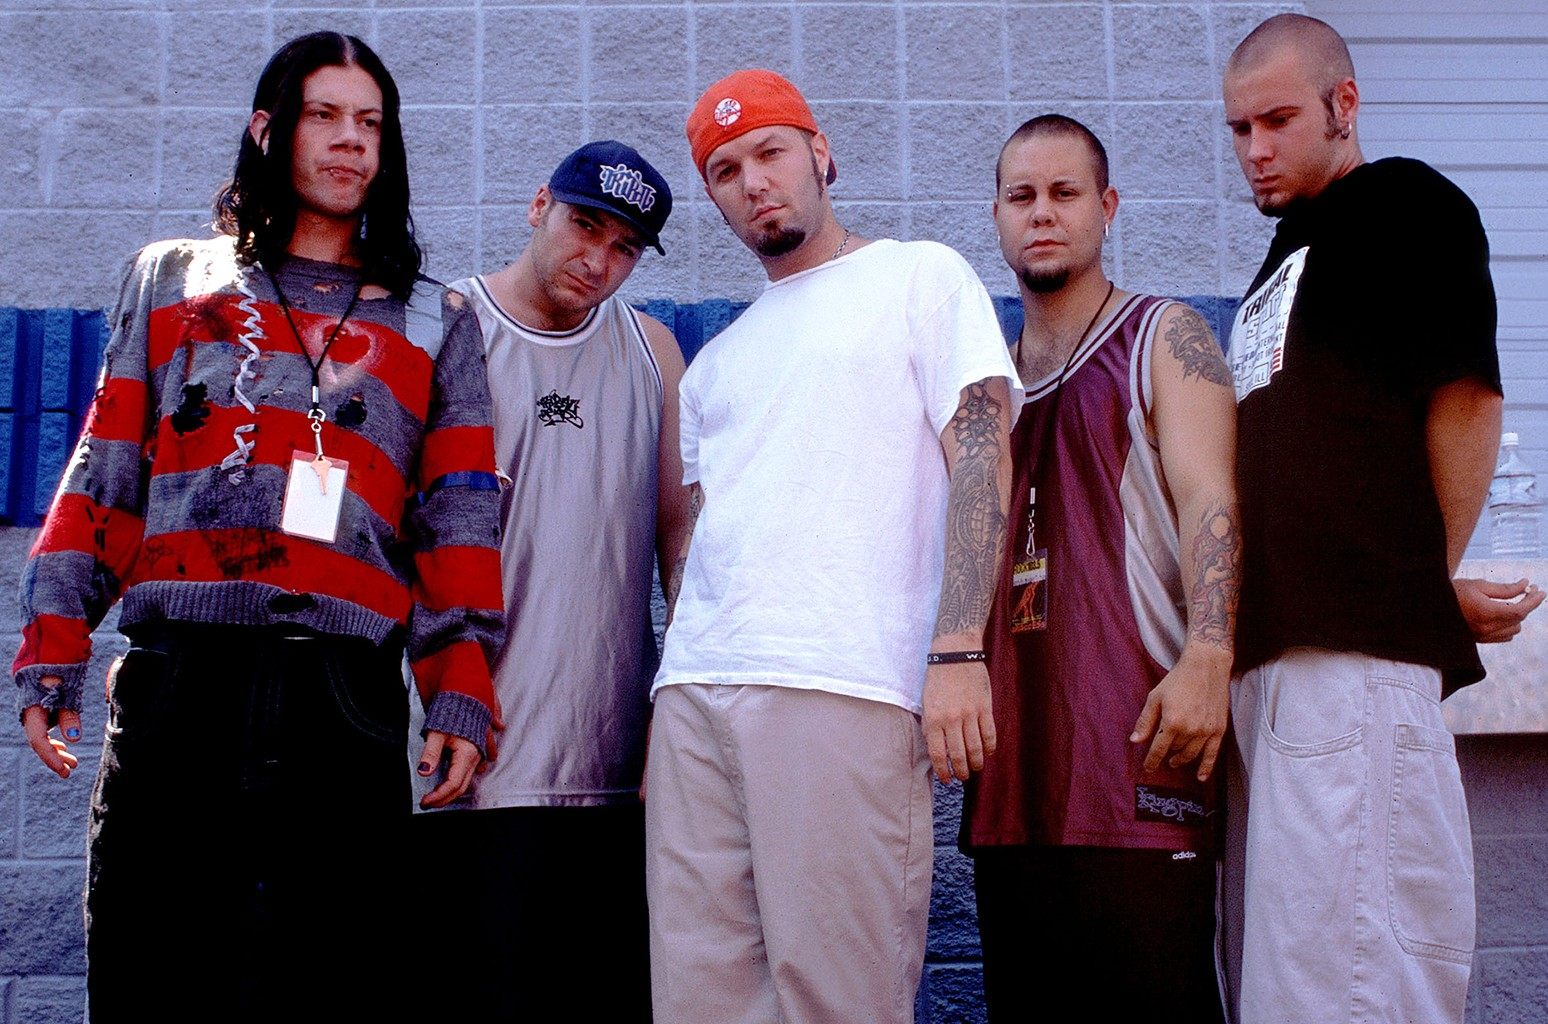 Limp Bizkit photographed on Sept. 6, 1997.